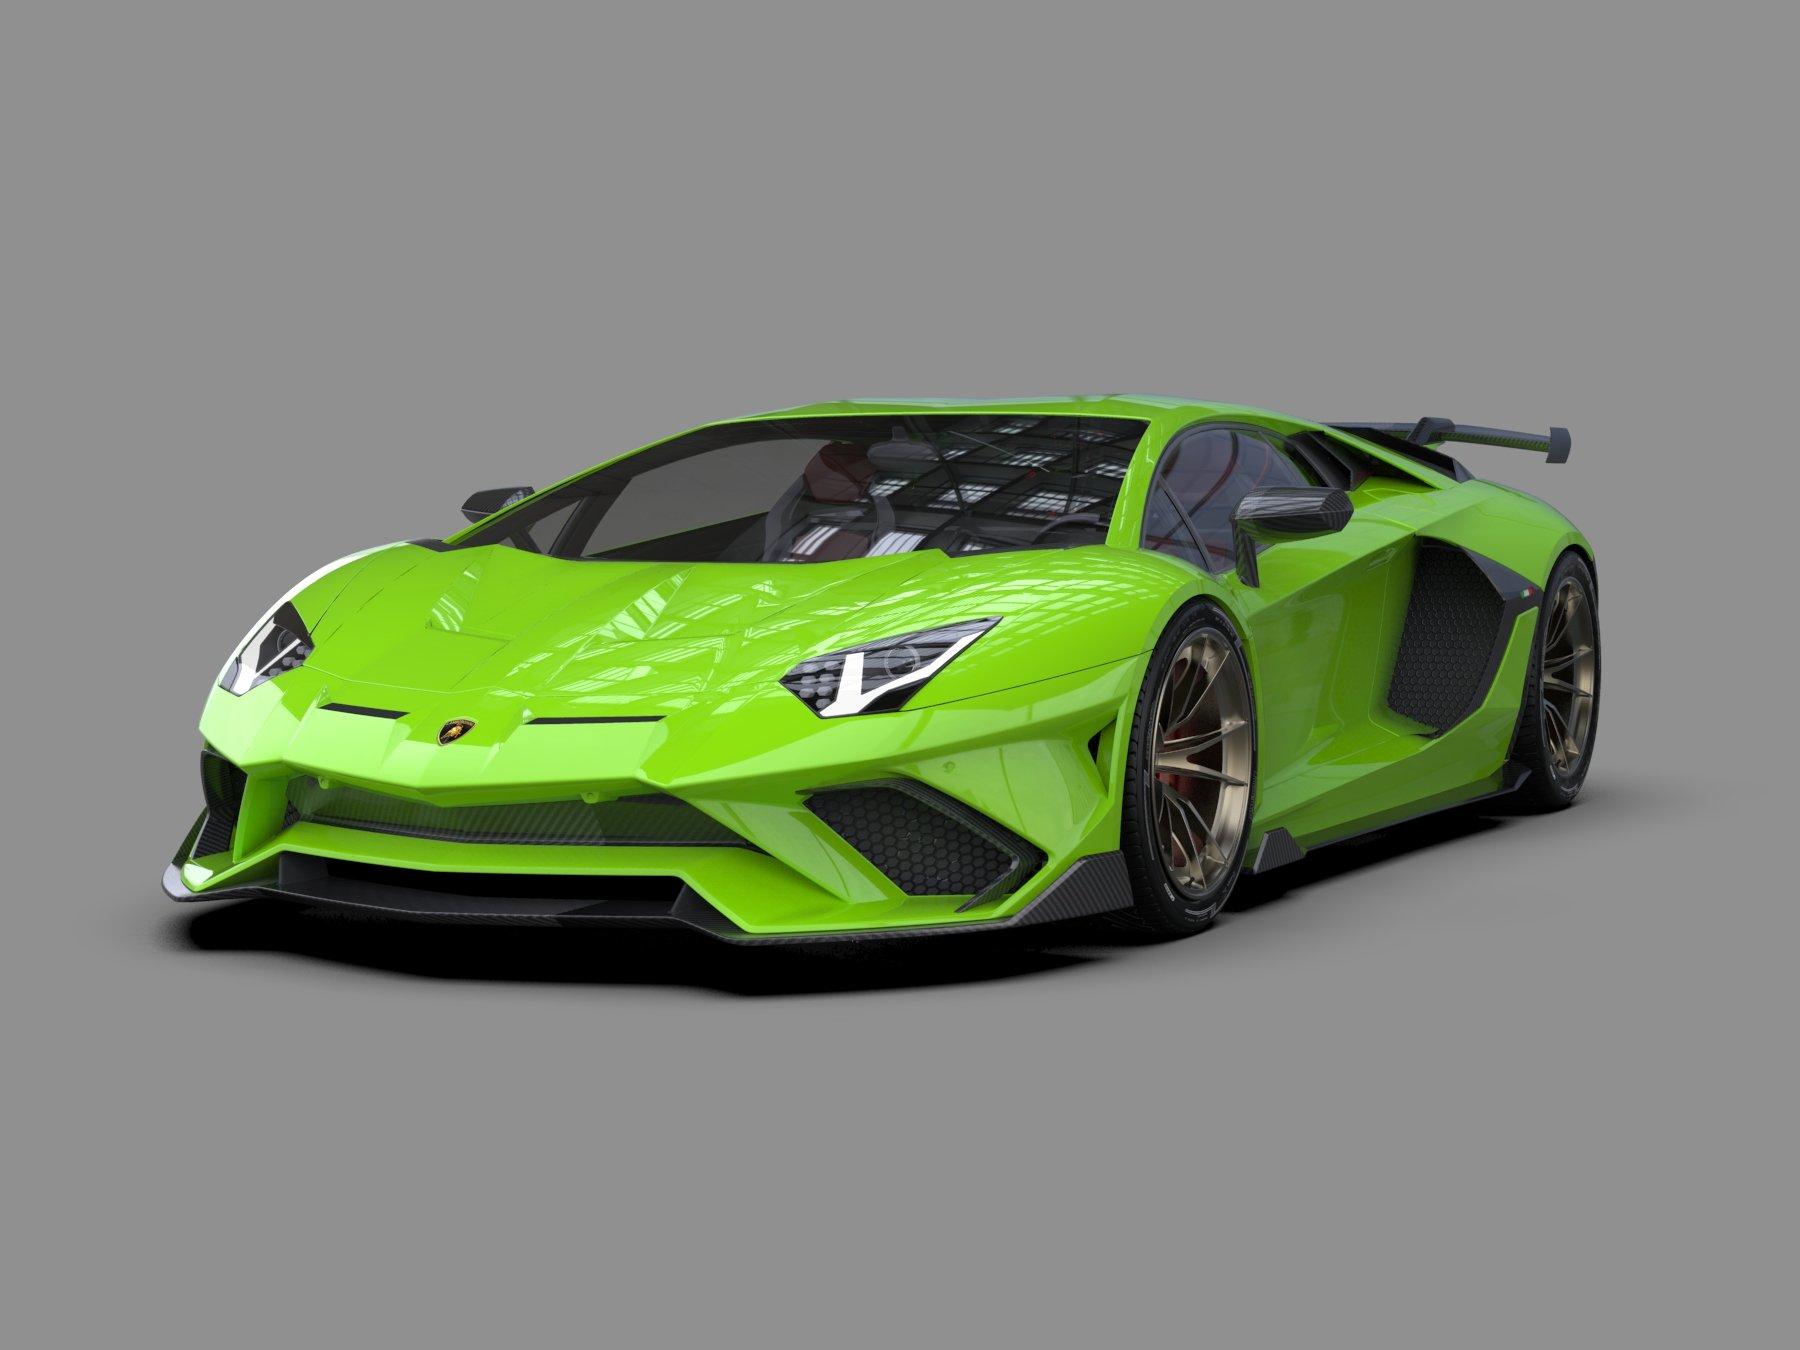 Lamborghini_Aventador_by_Duke_Dynamics_0027